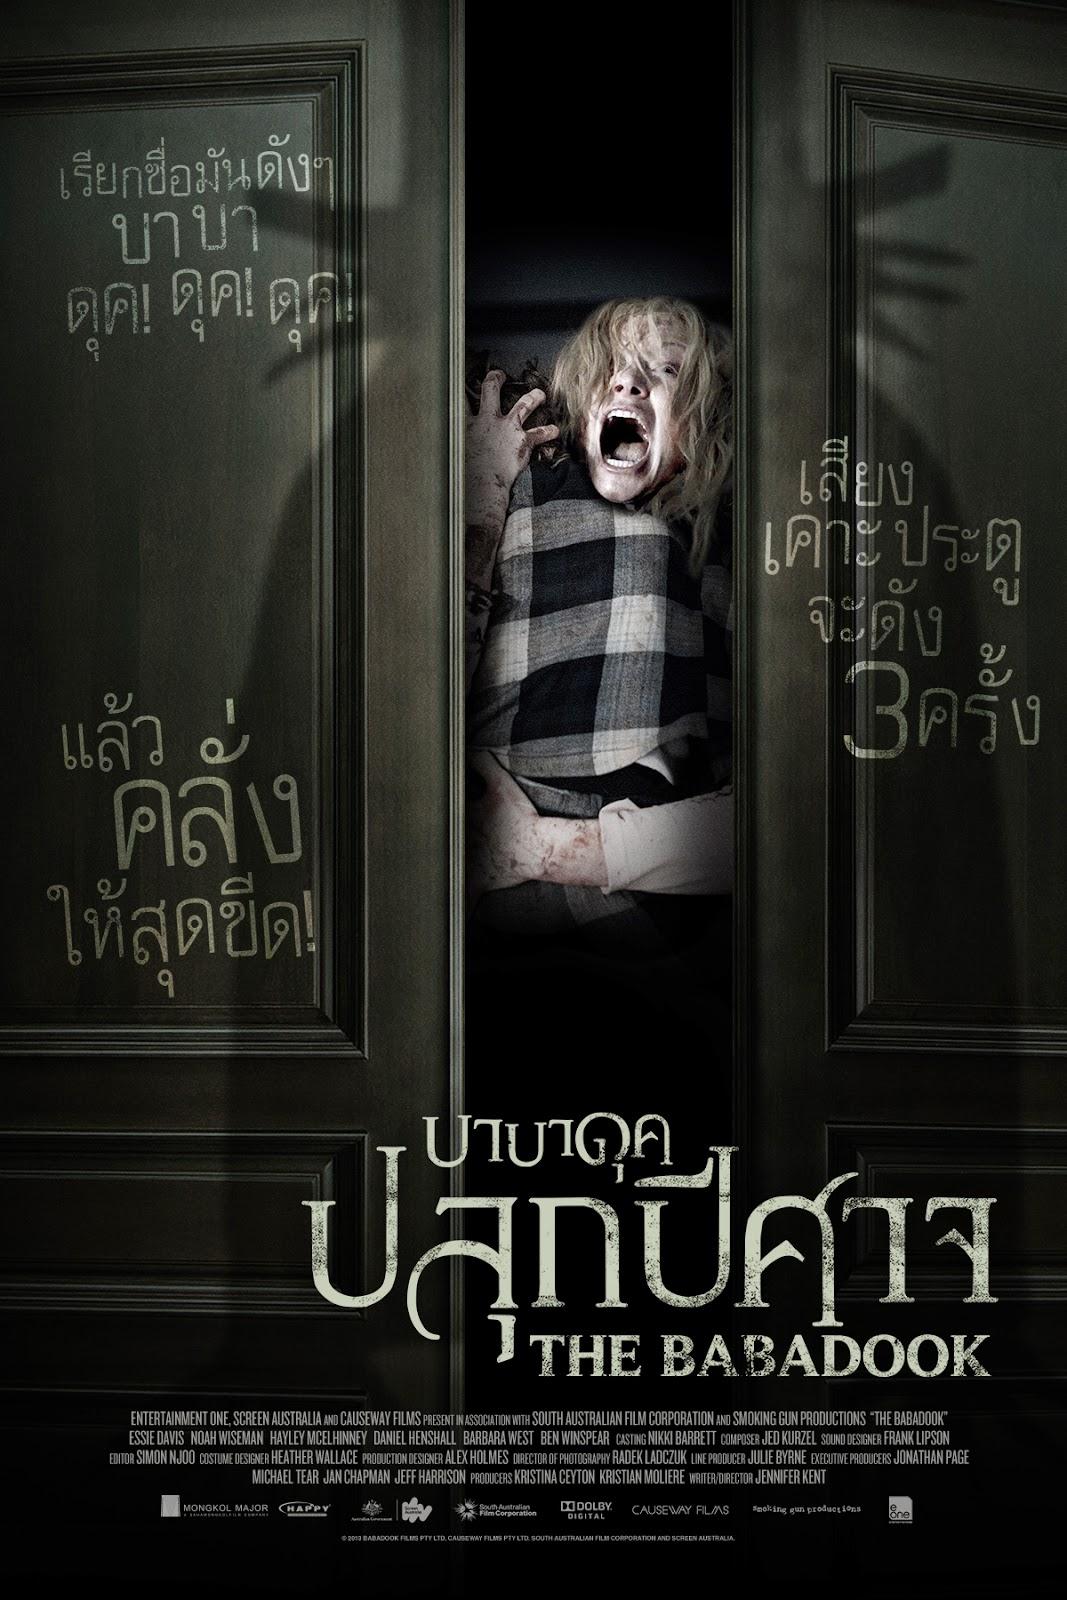 THE BABADOOK บาบาดุค ปลุกปีศาจ HD มาสเตอร์ พากย์ไทย